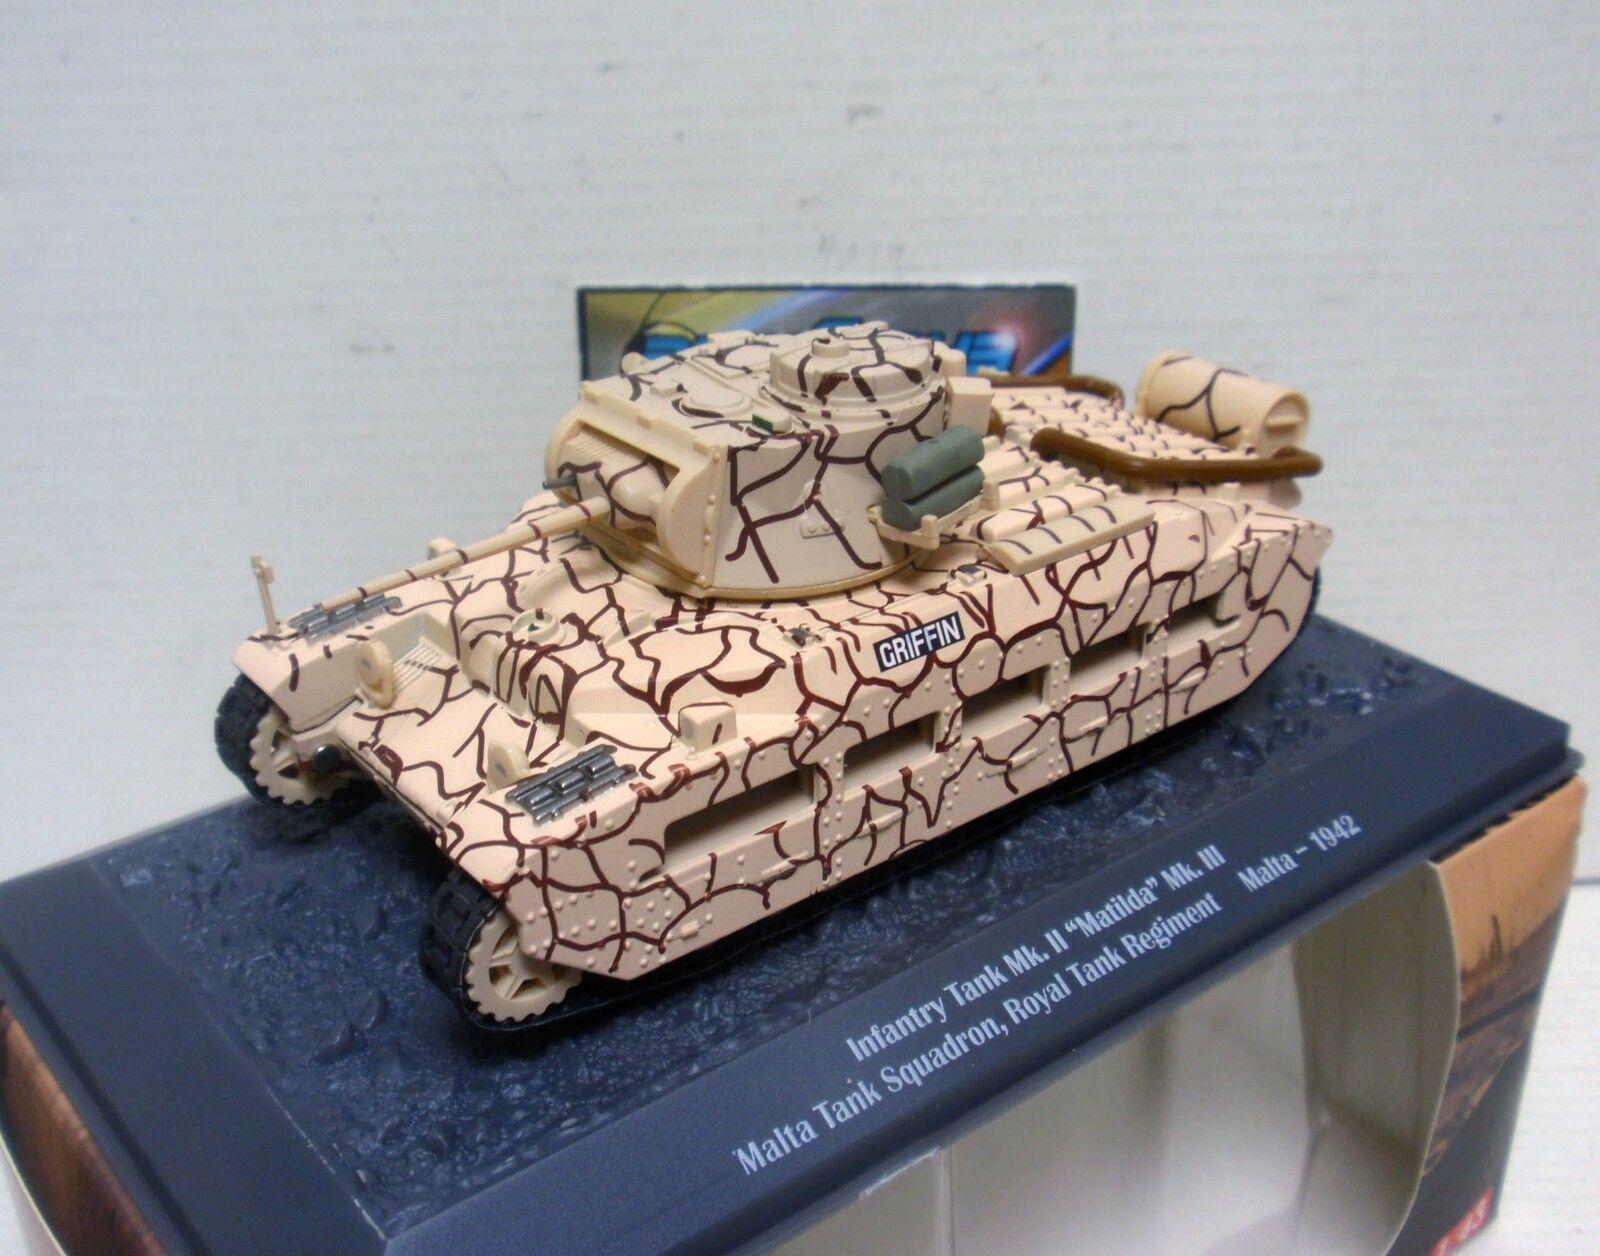 TANQUE TANK INFANTRY Mk II MATILDA Mk III ROYAL TANK MALTA 1942 1 43 ALTAYA